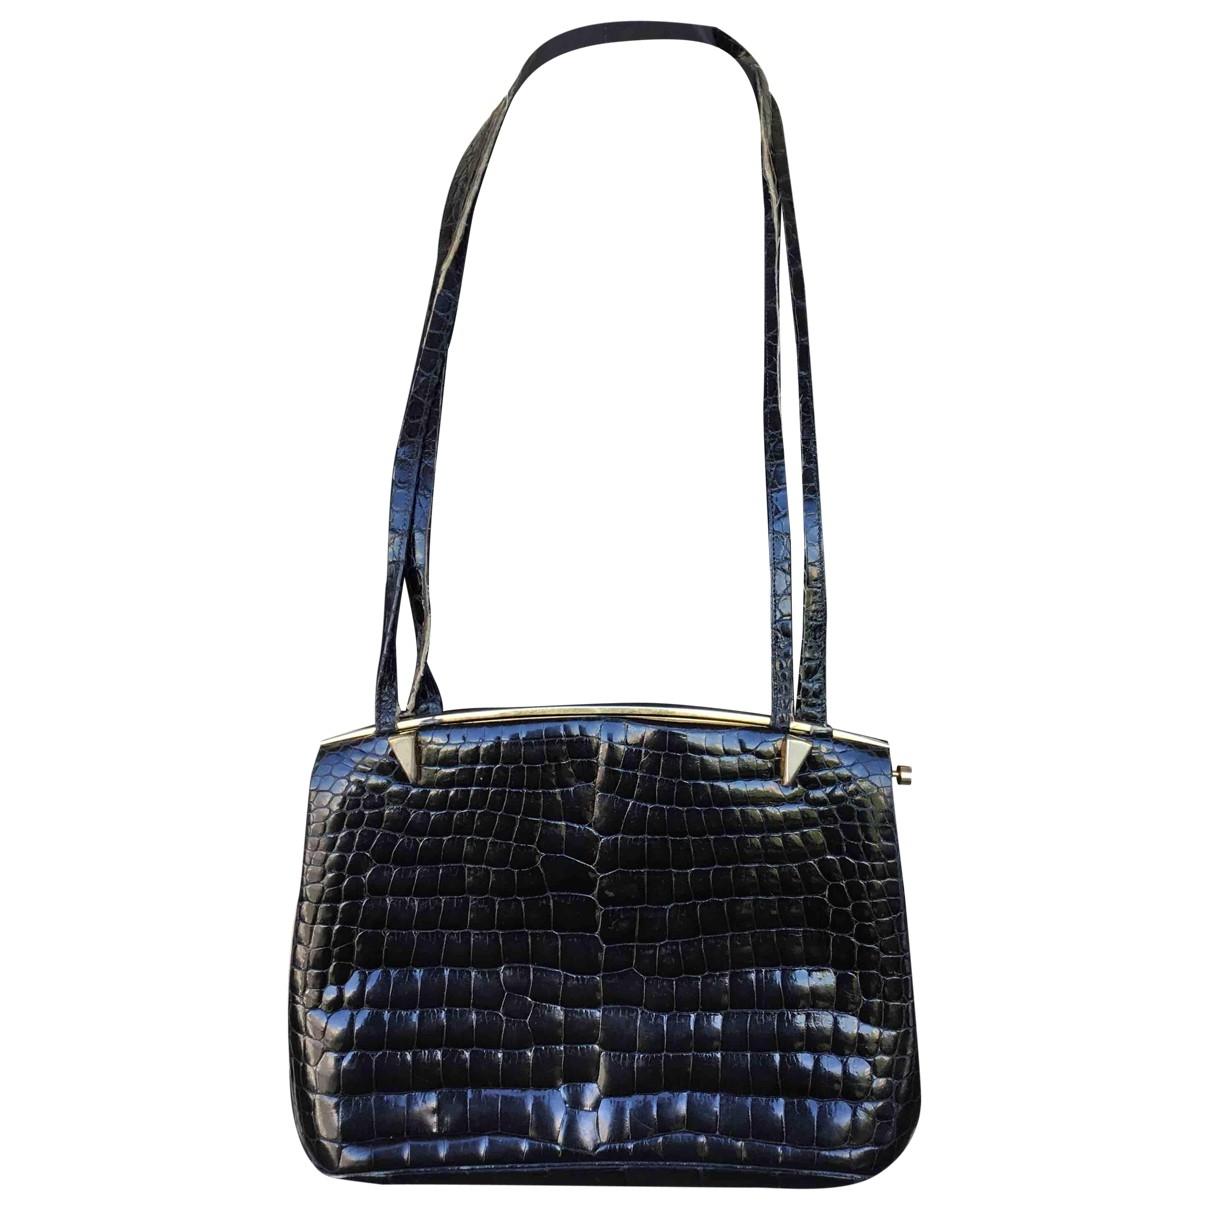 Delvaux \N Handtasche in  Schwarz Krokodil